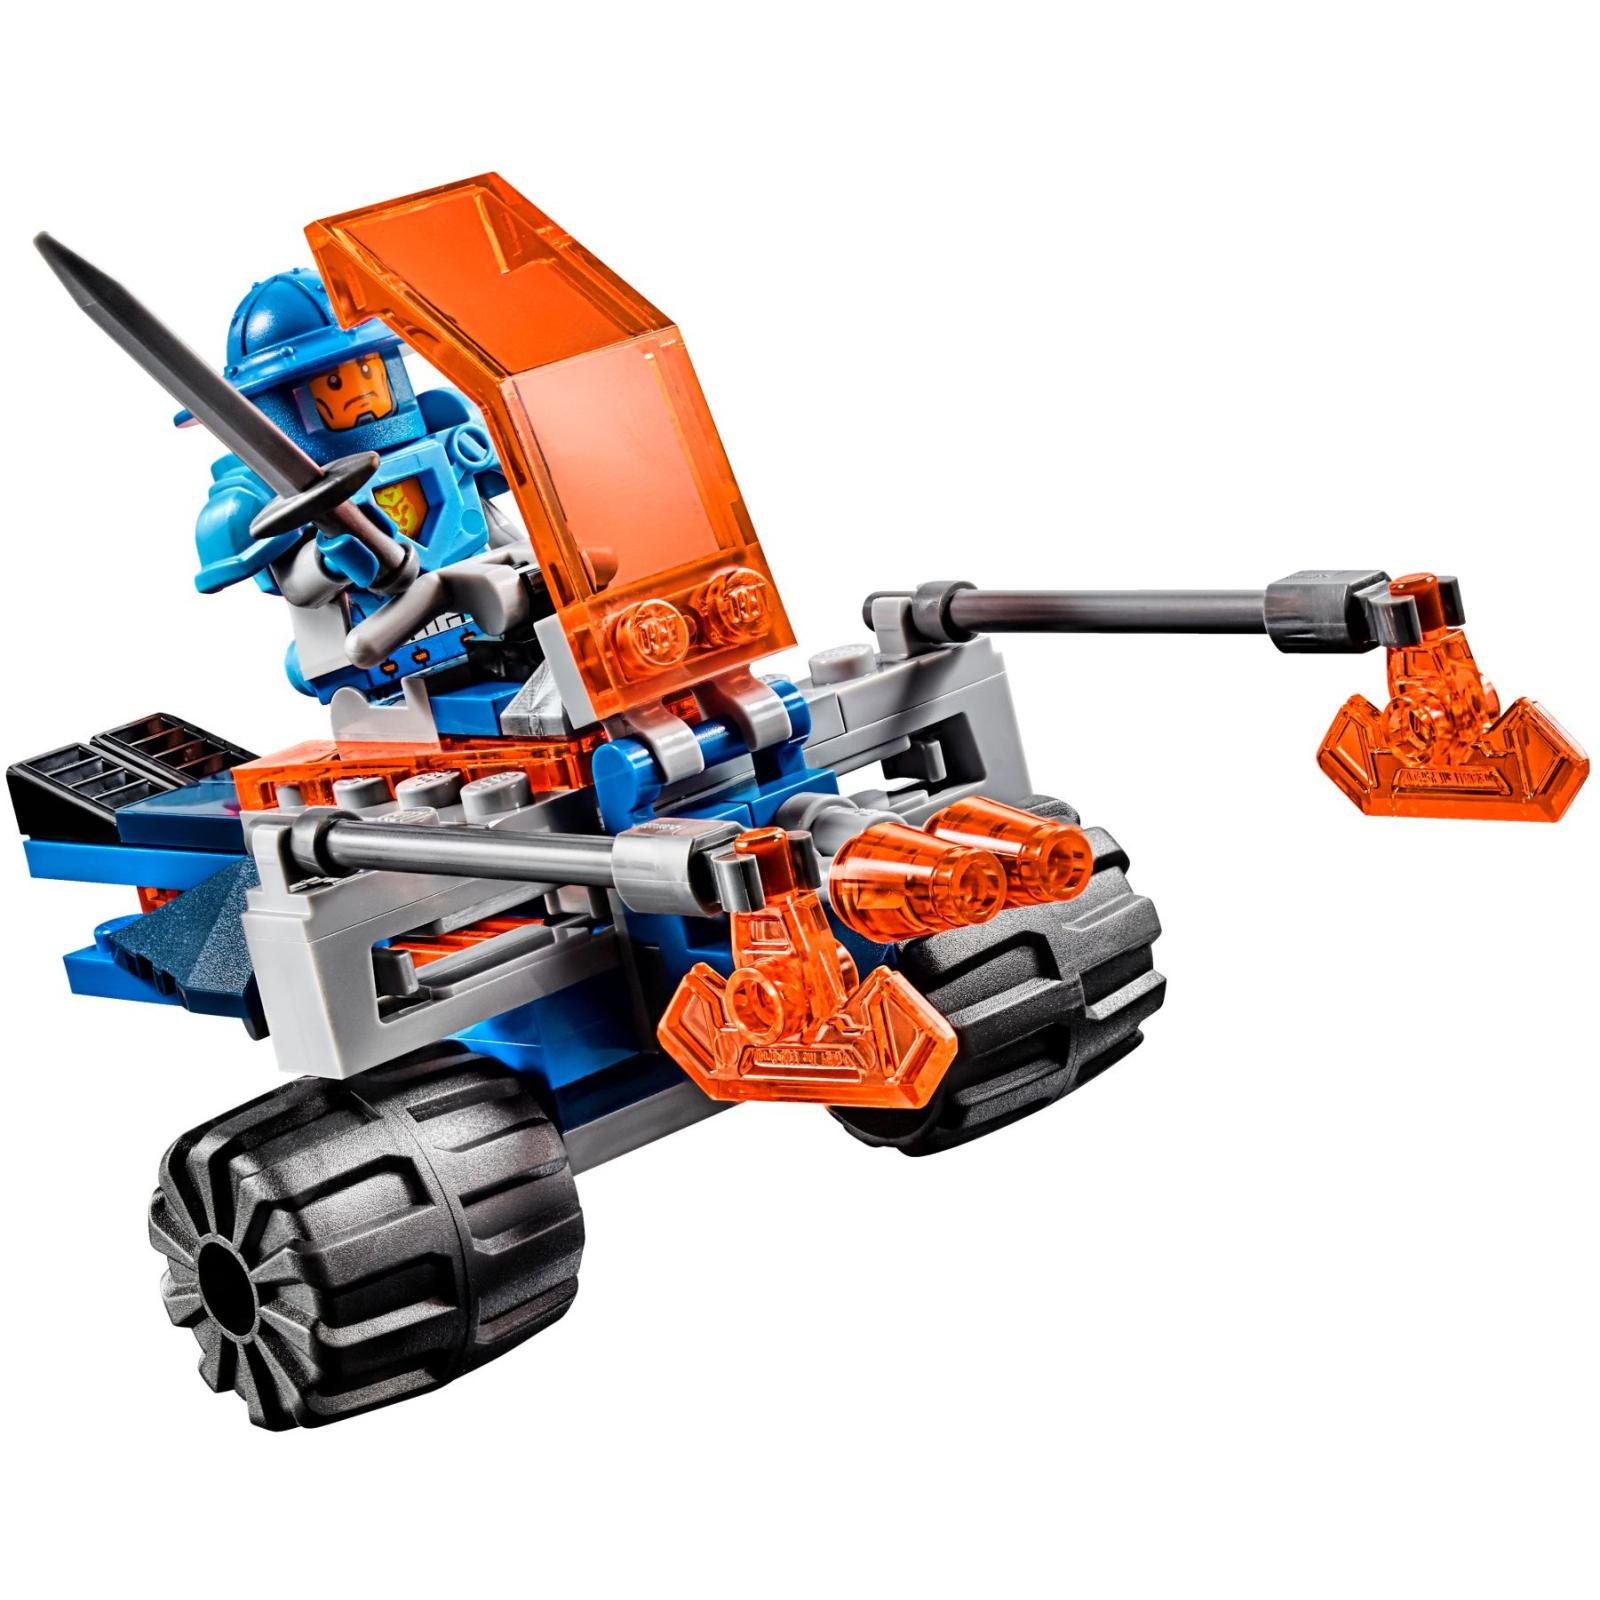 Конструктор LEGO Nexo Knights Королевский боевой бластер (70310) изображение 3